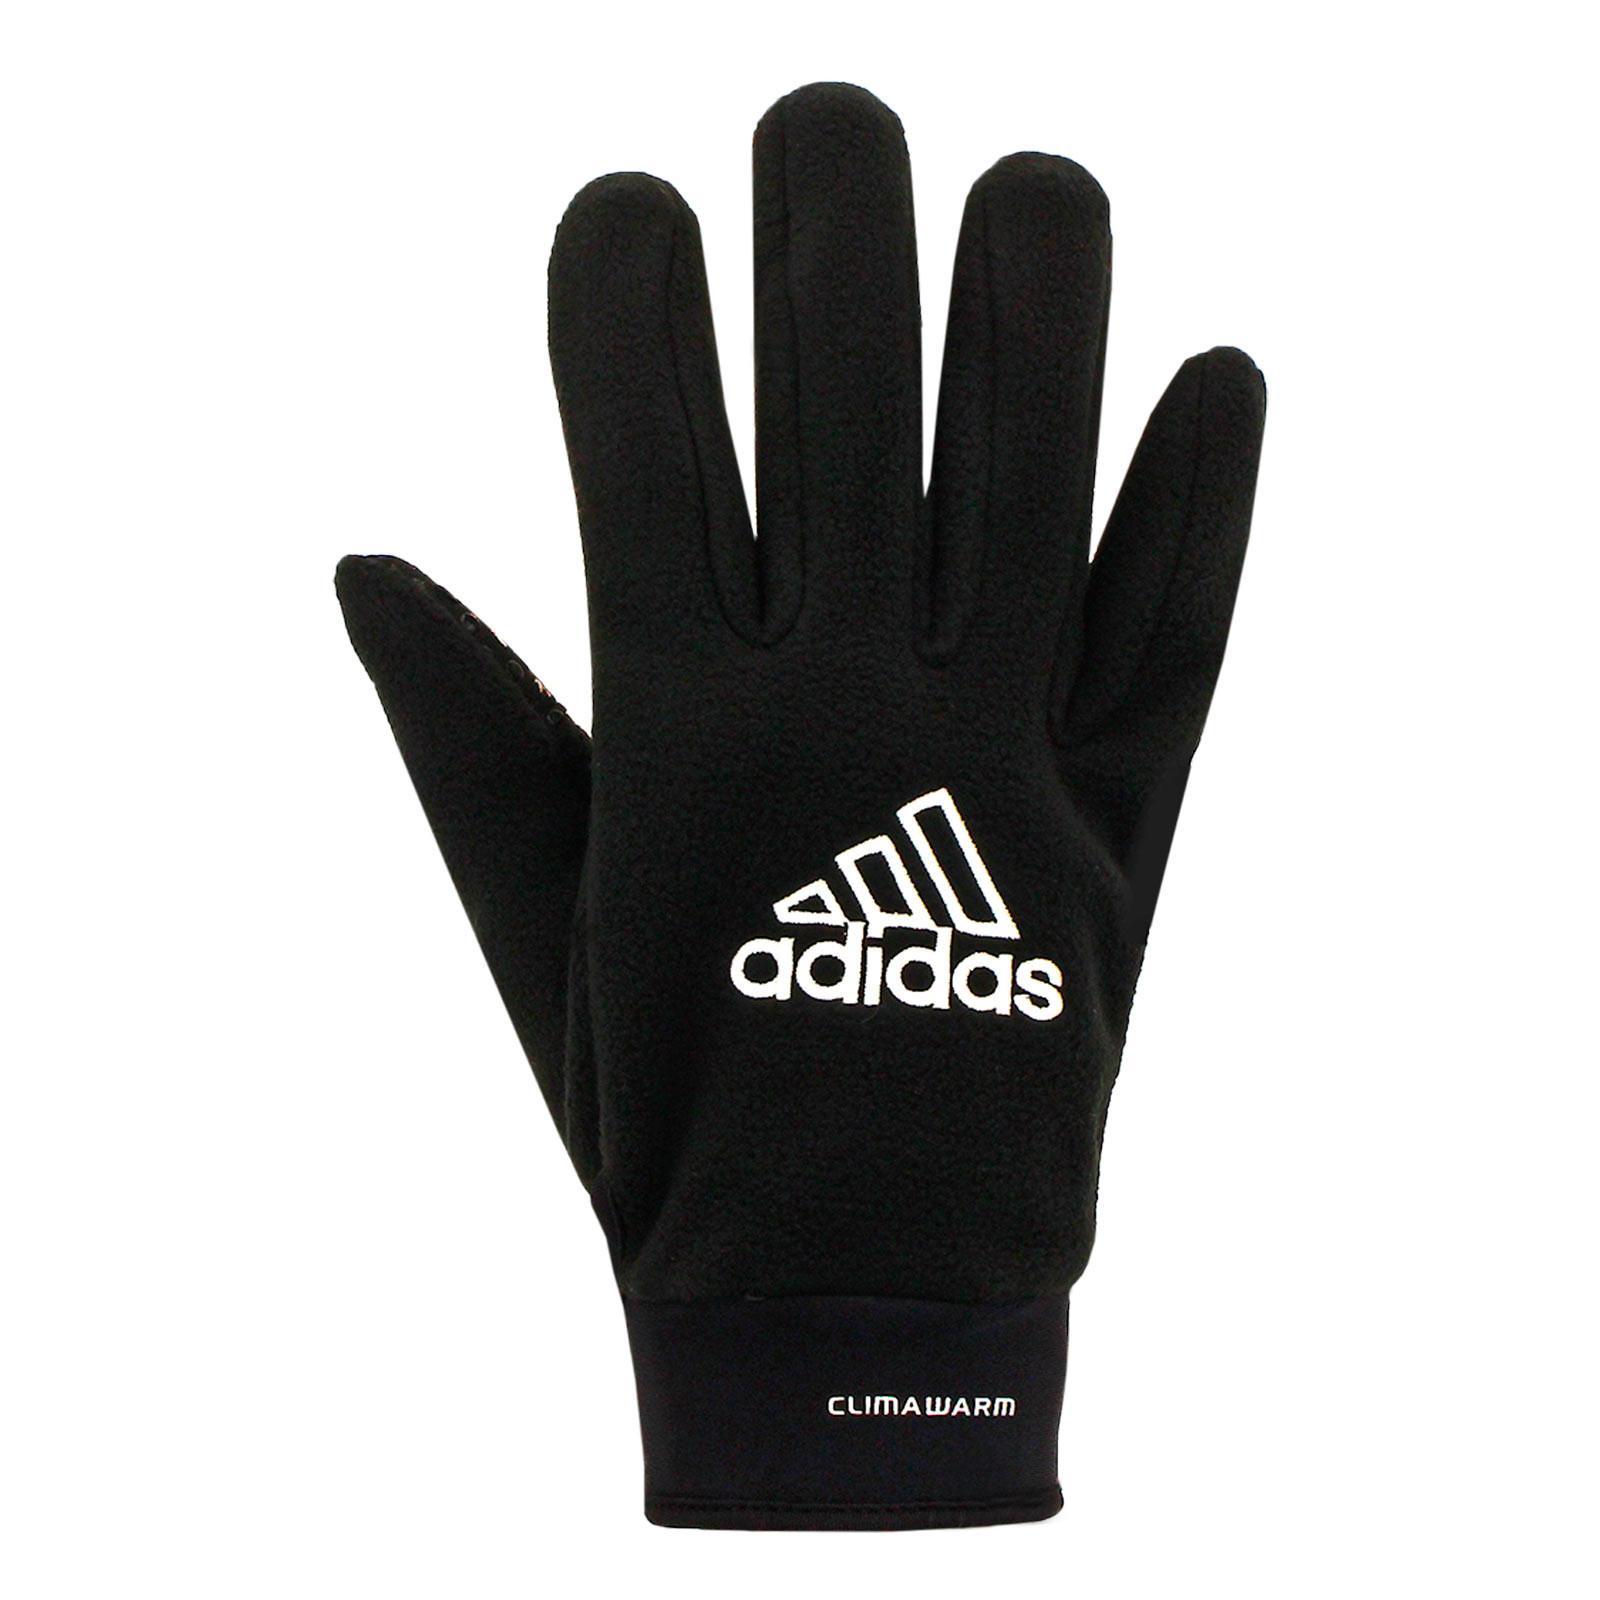 b82e3020b27f2  0 3 033905-A Guantes-adidas-fieldplayer-negro 1 frontal.jpg